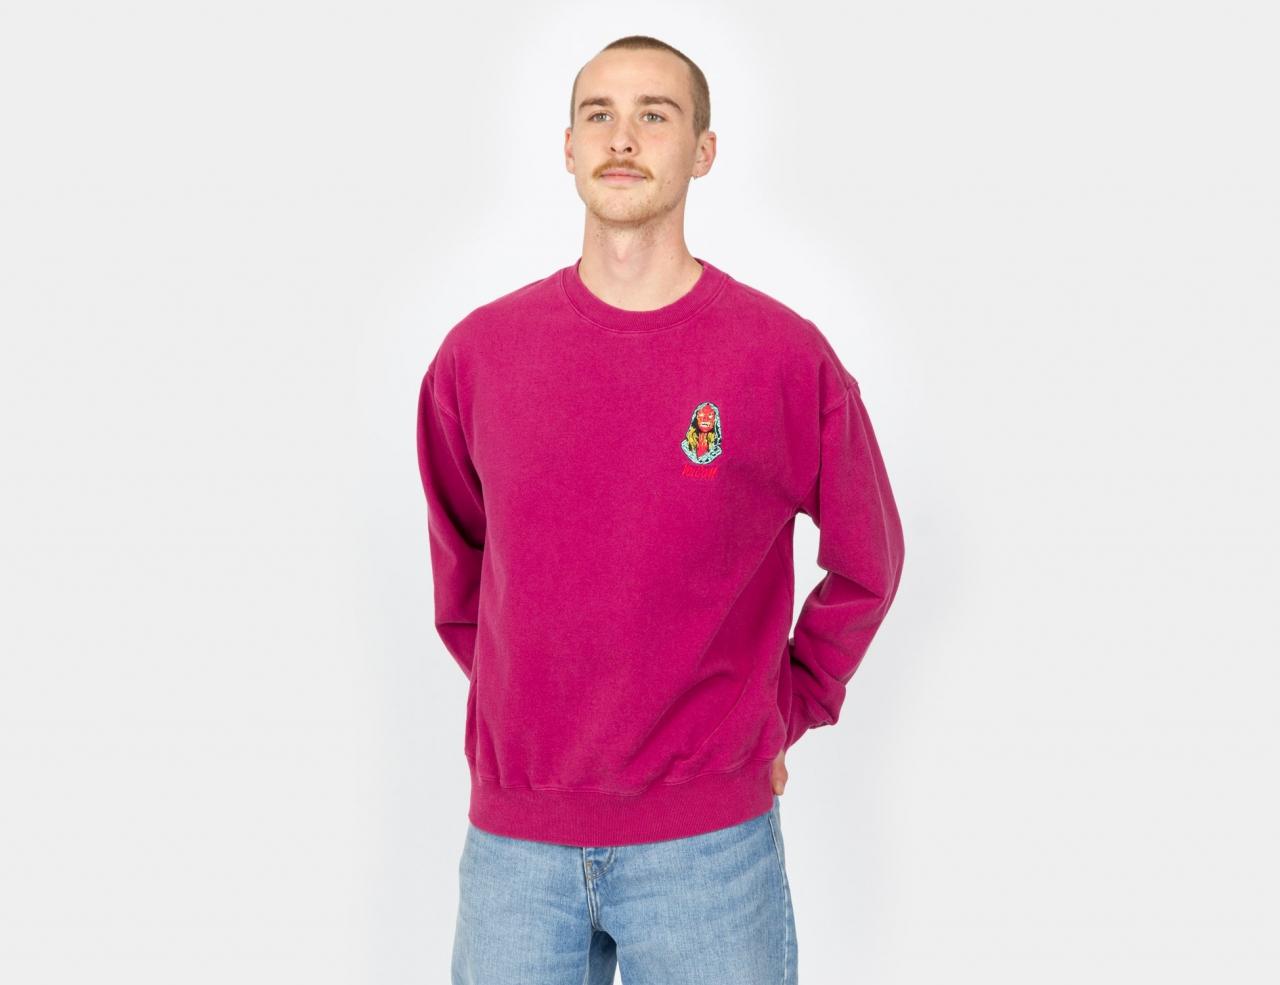 Volcom Black Sounds Sweatshirt - Raspberry Radiance